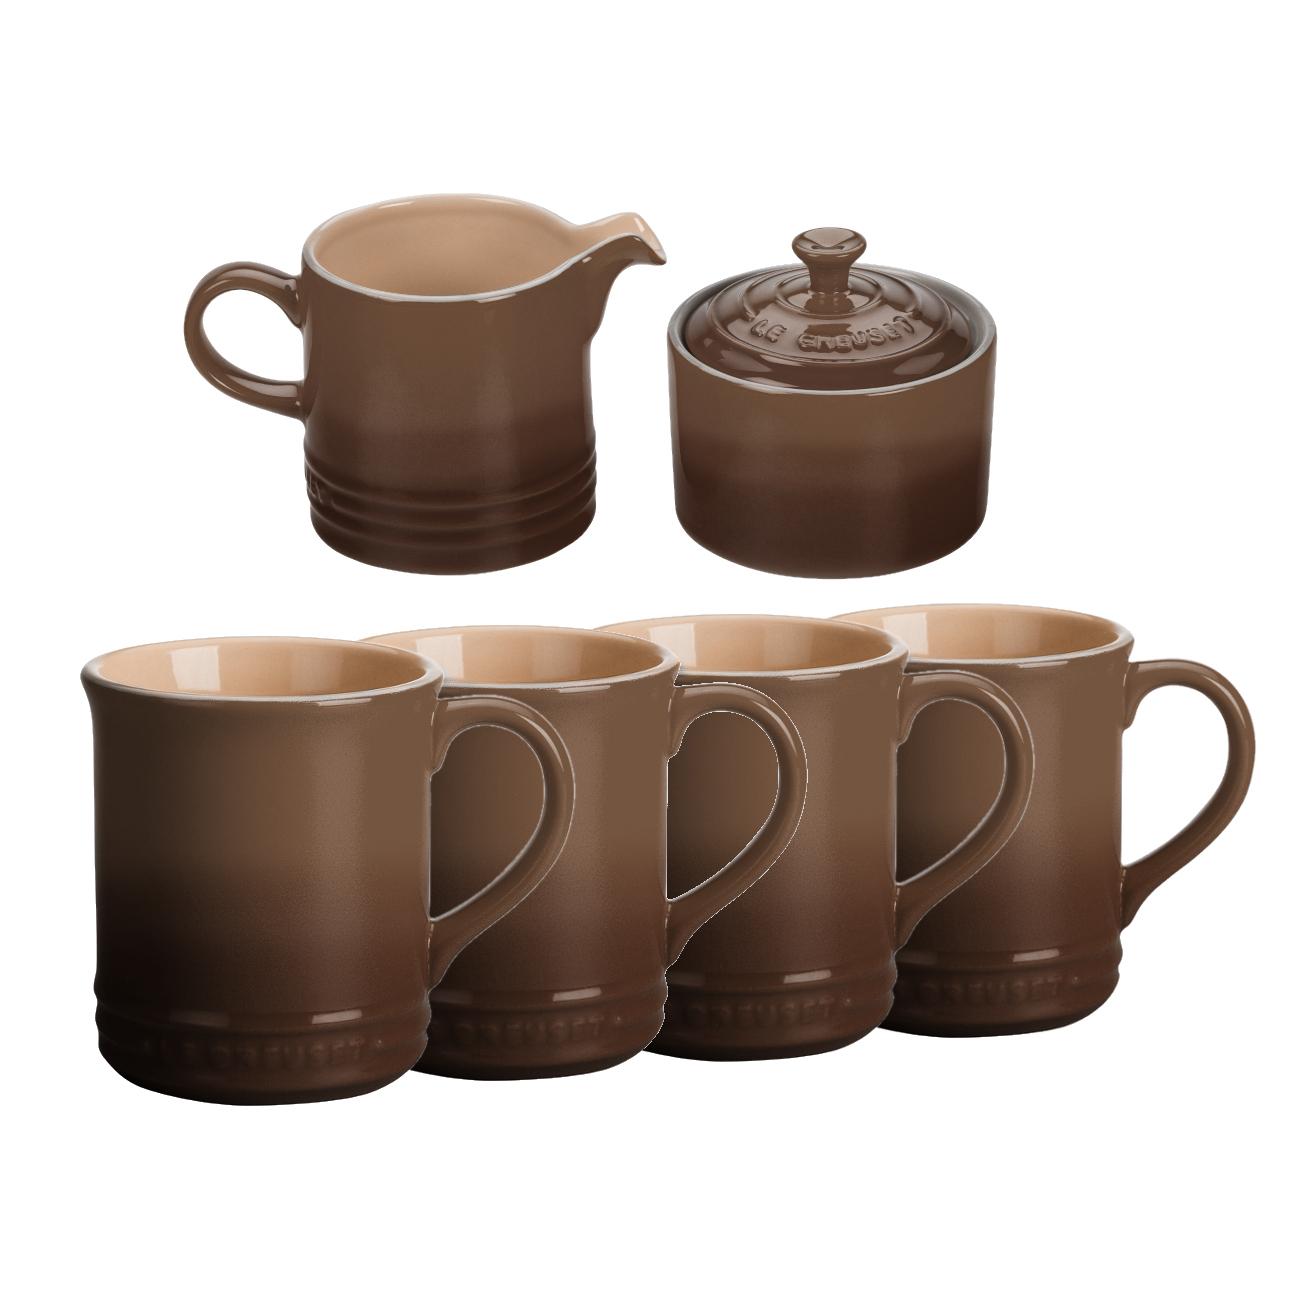 Le Creuset 6 Piece Truffle Stoneware Coffee or Tea Service Set With Mugs & Cream & Sugar Set